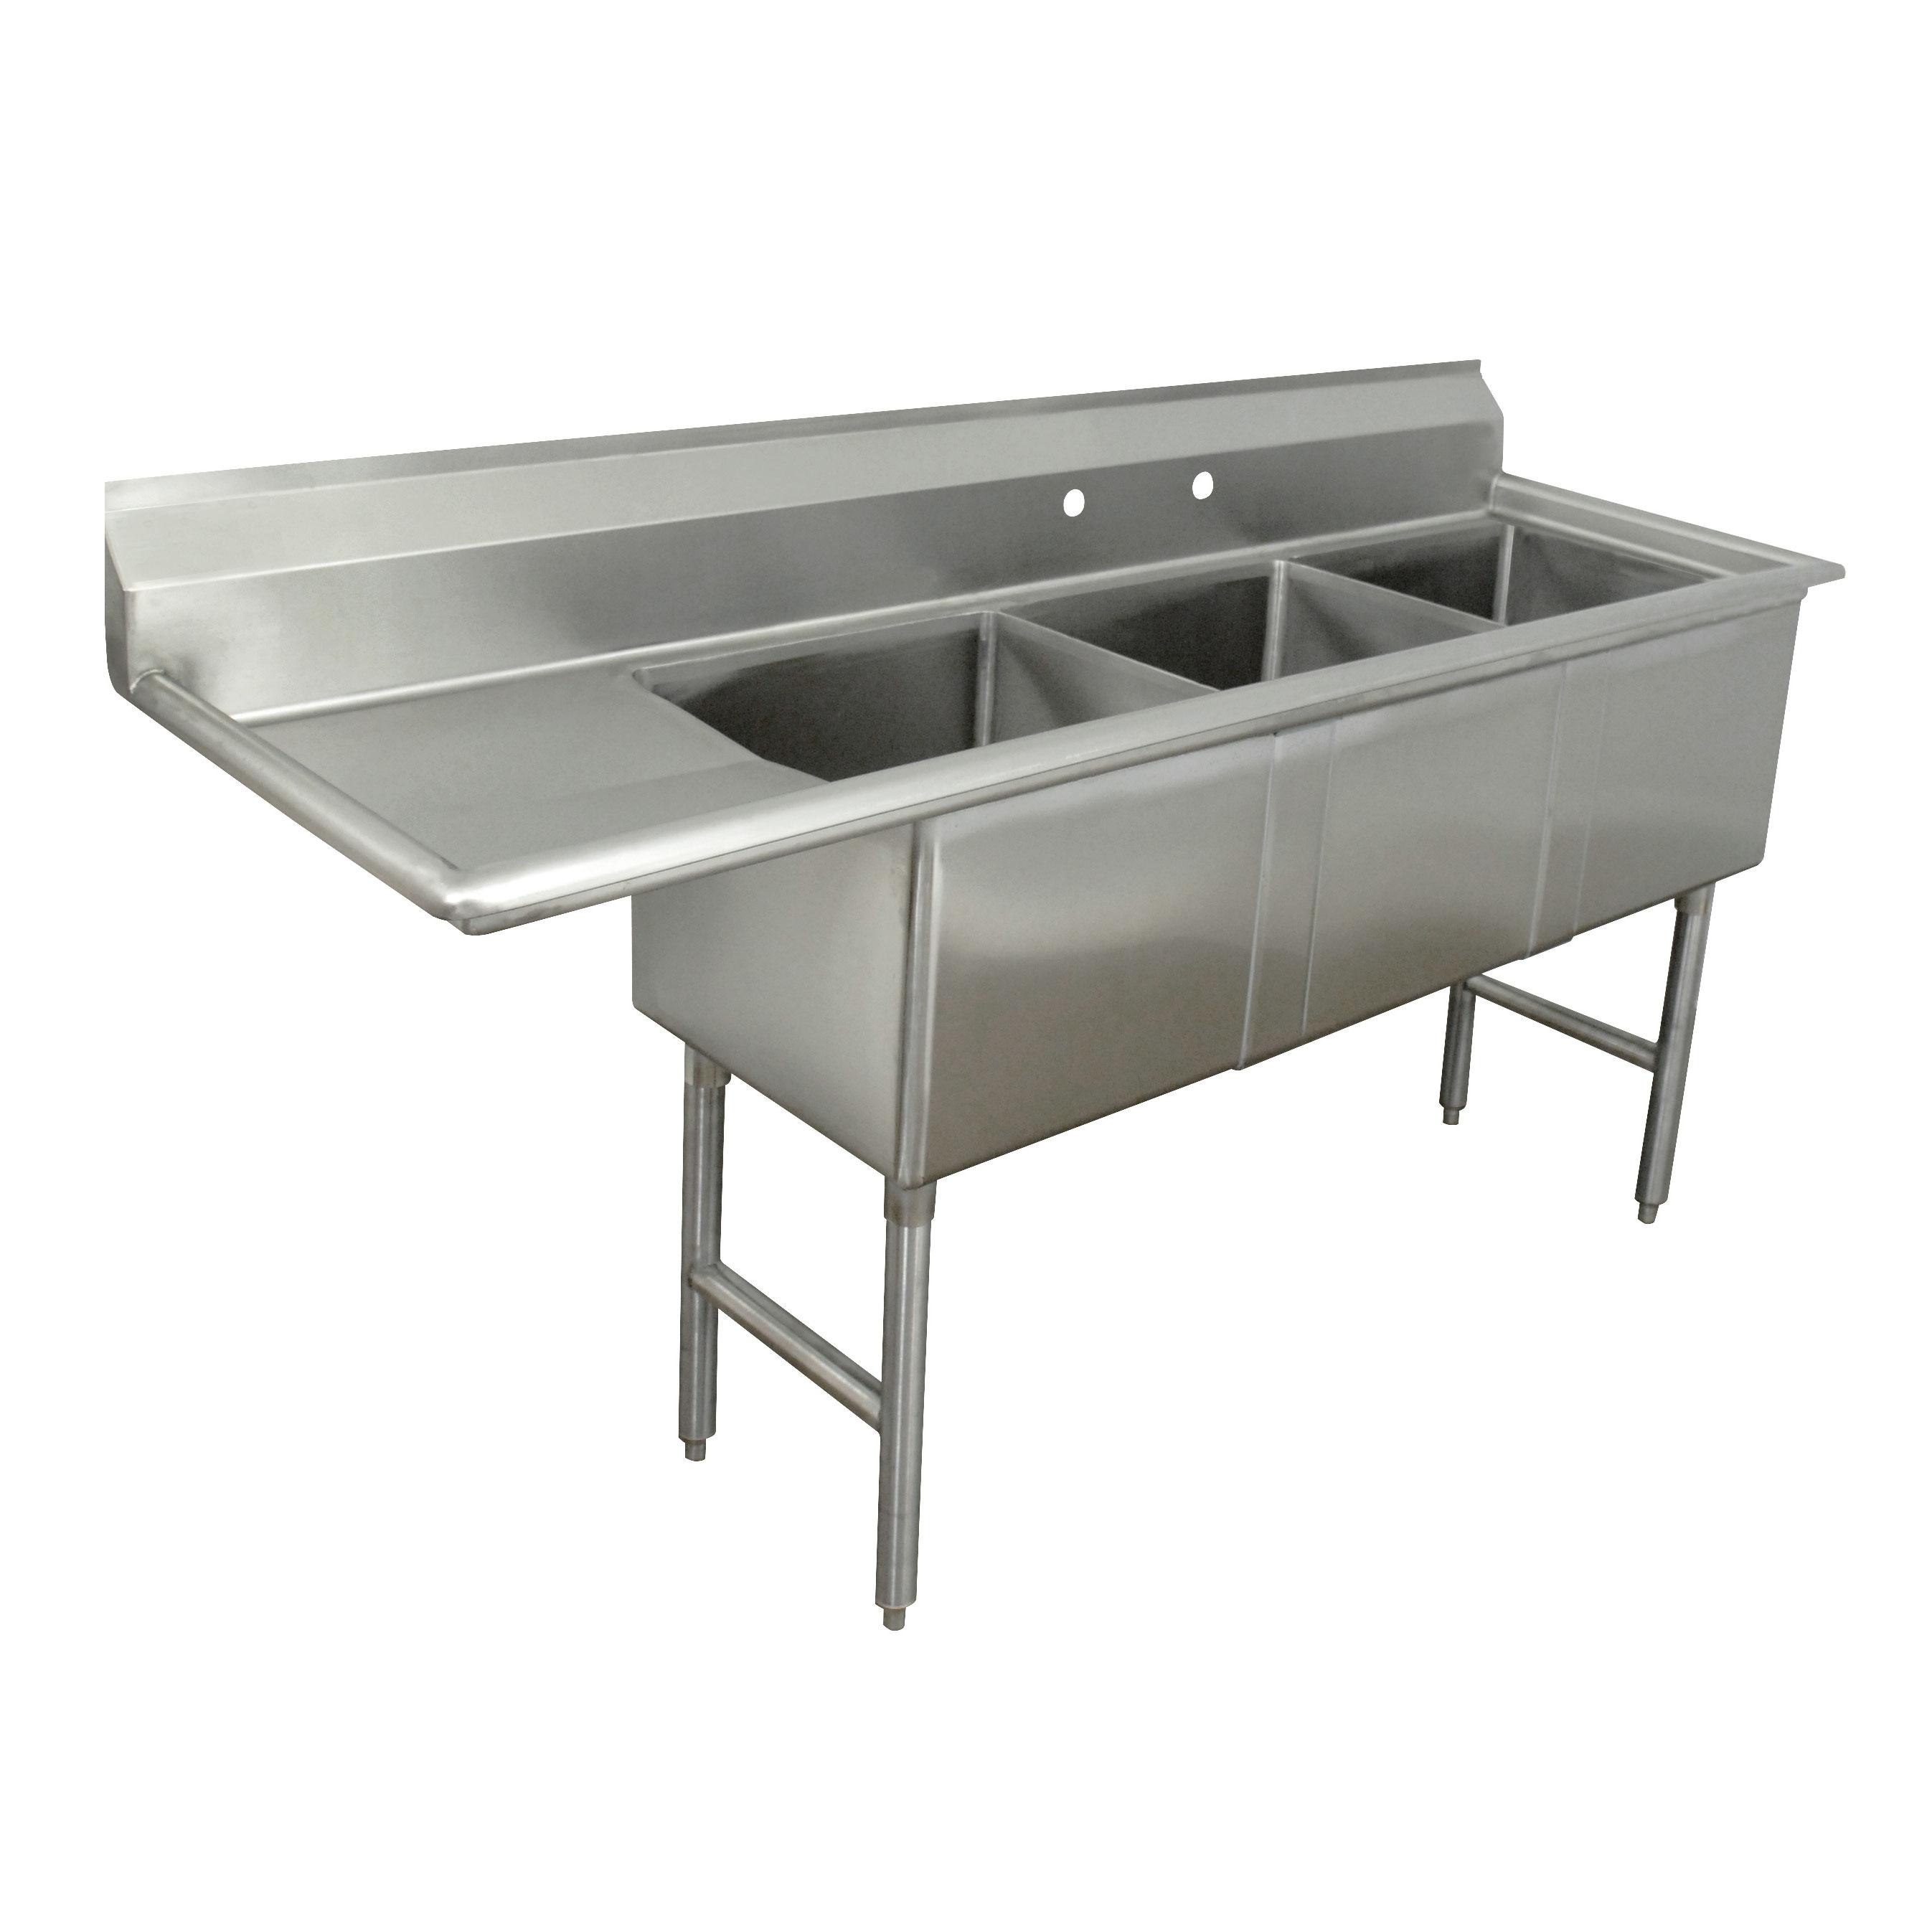 Advance Tabco FC-3-3024-24L sink, (3) three compartment